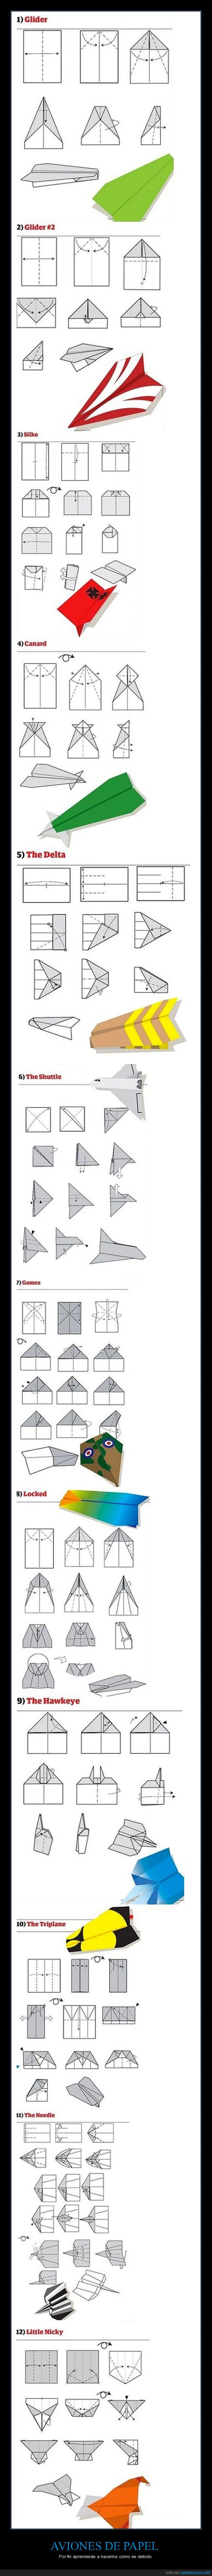 avion,doblar,origami,papel,papiroflexia,tipos